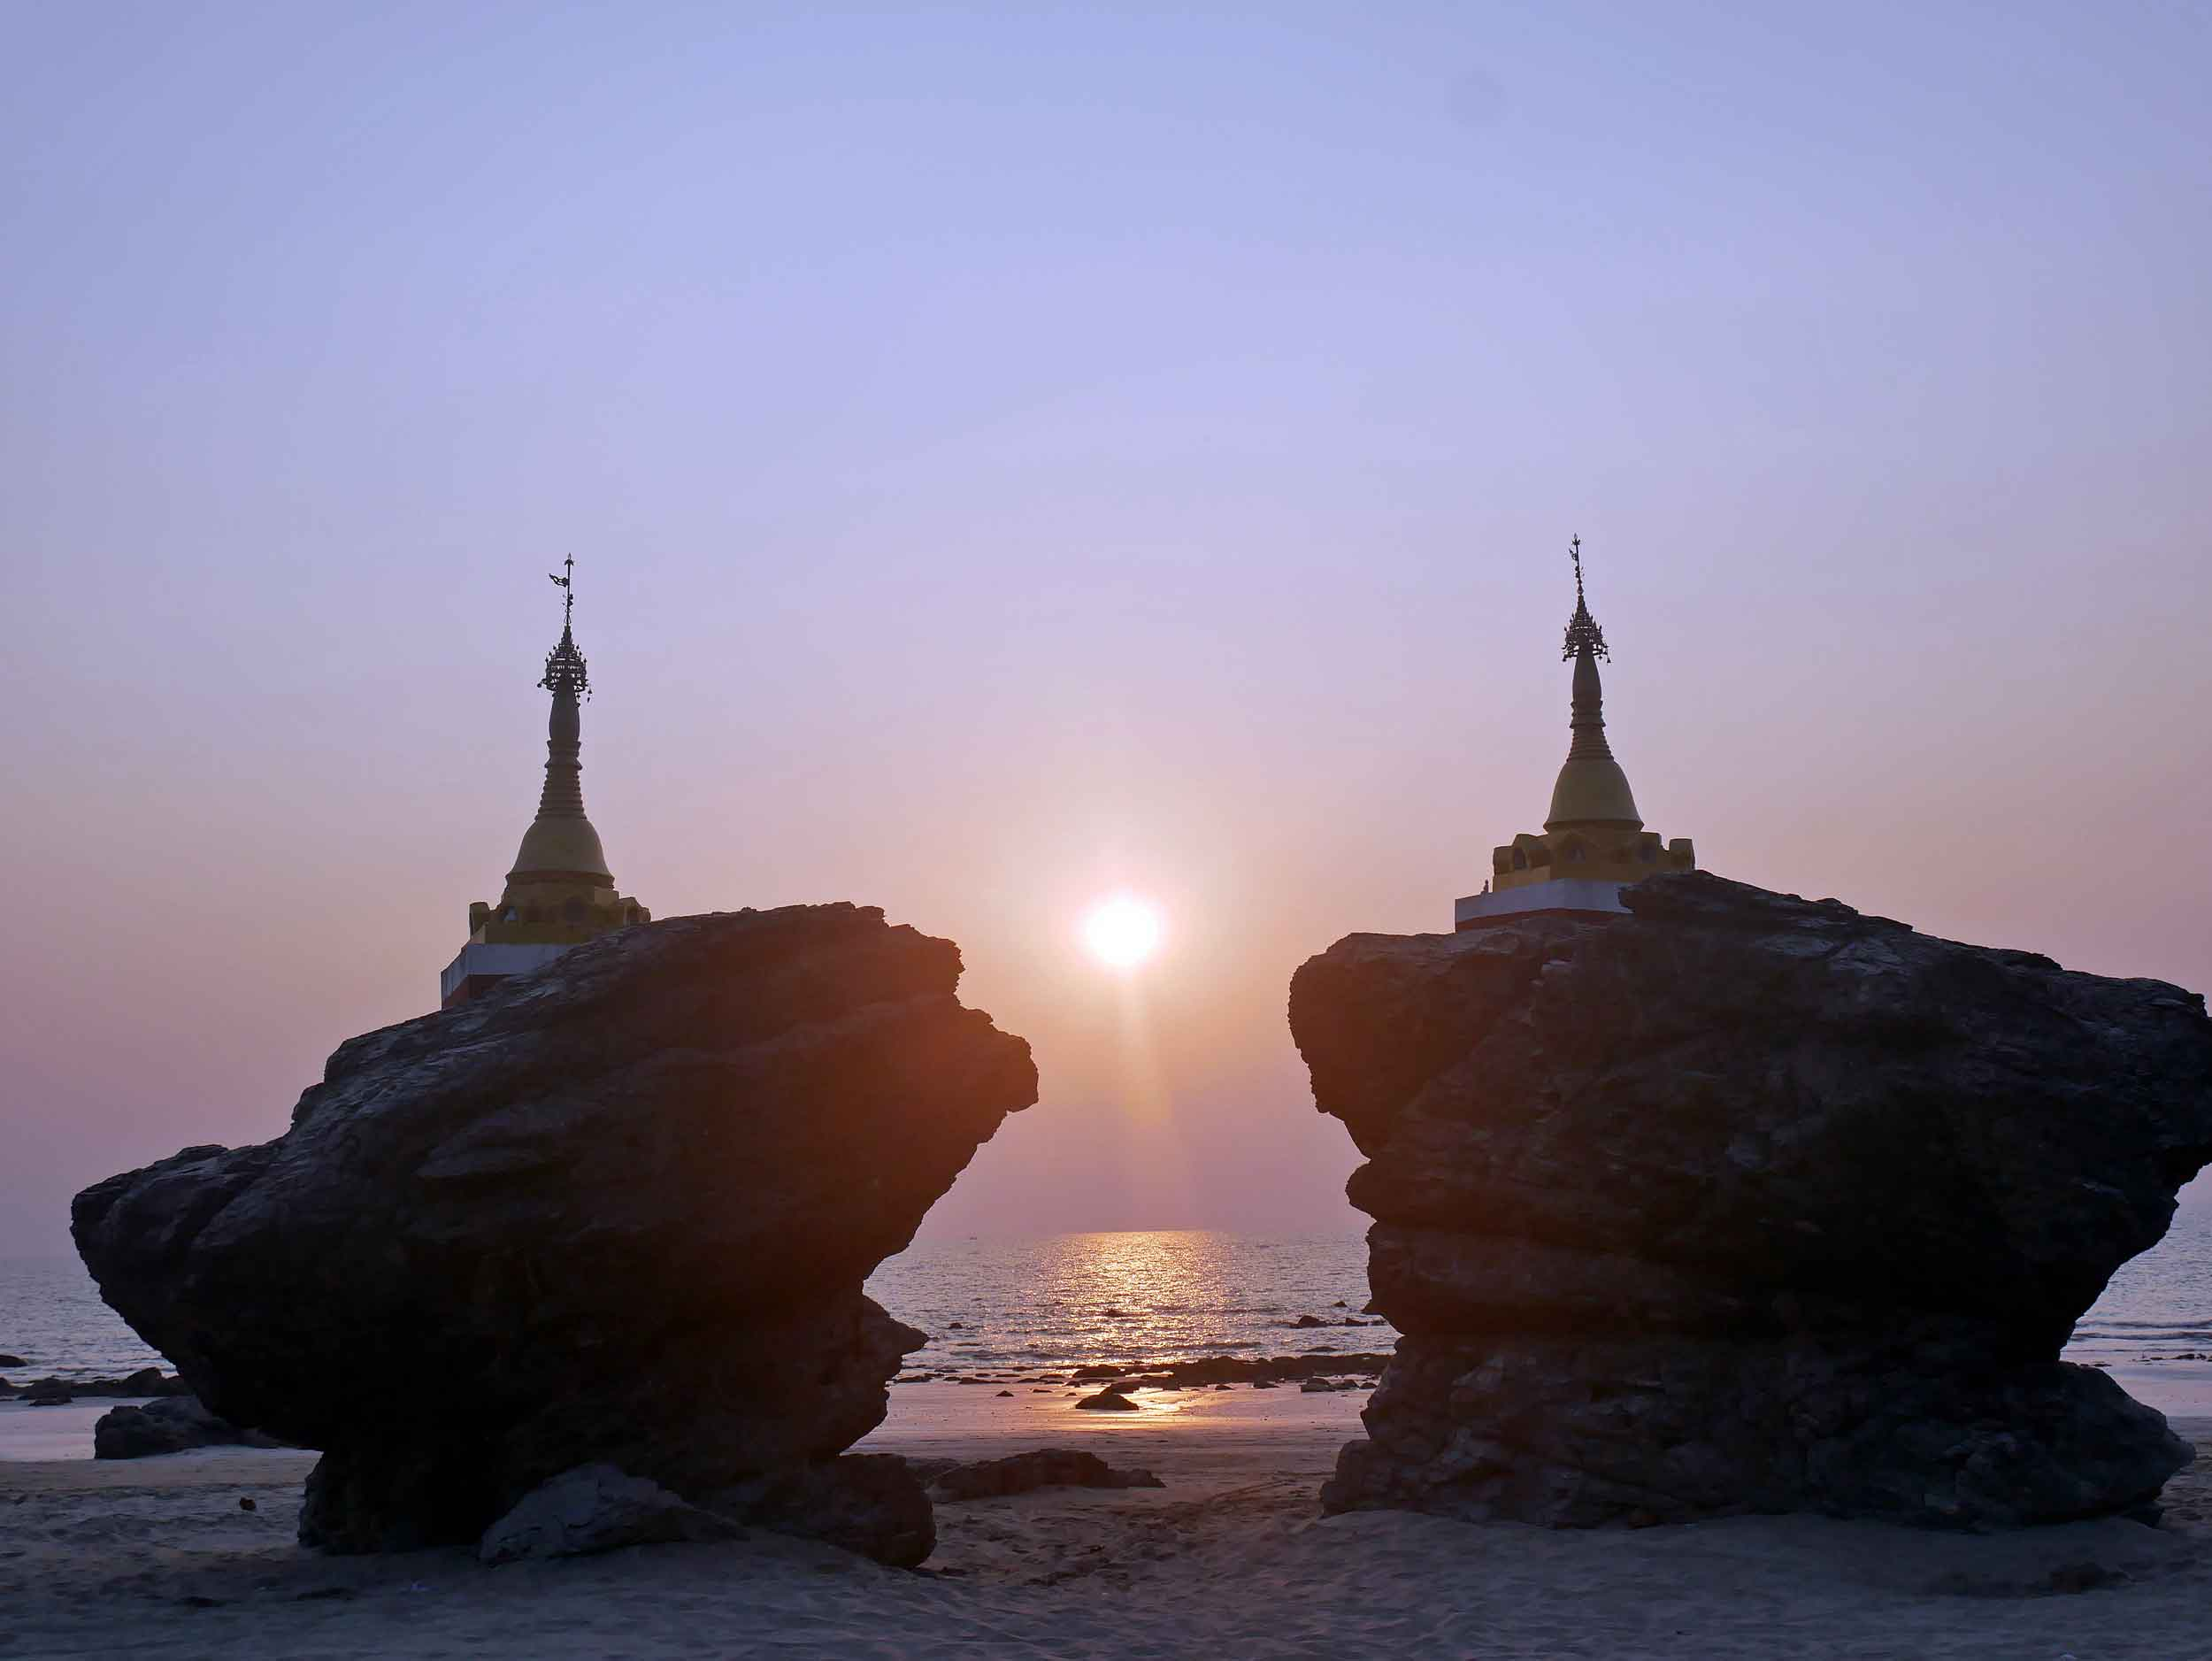 Kyauk Maumghnama Pagoda (or brother and sister rocks) provides a still space to soak up sunset (Feb 13).